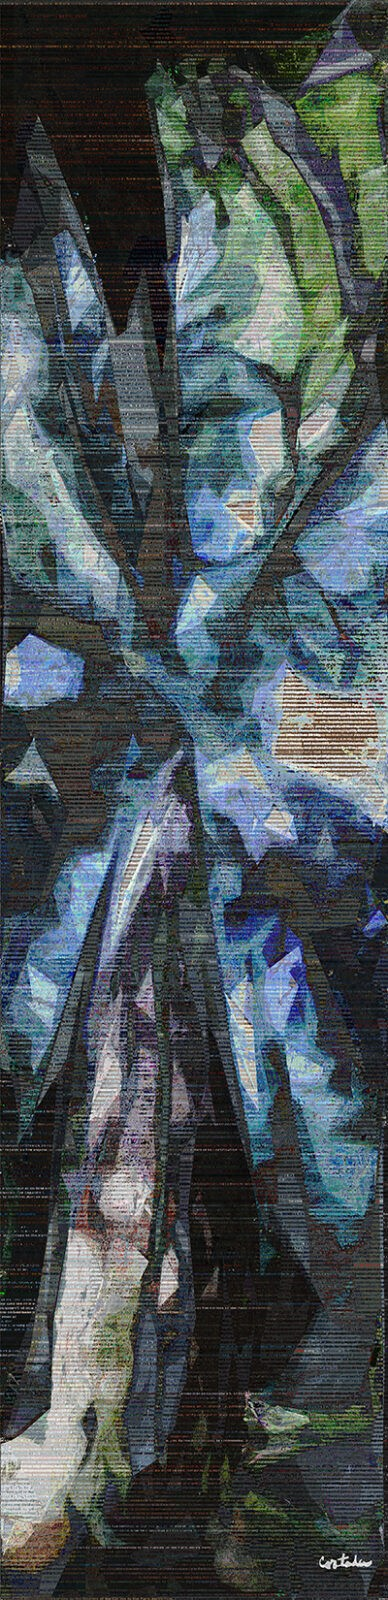 "Xavier Cortada, ""Ancient Forests: COP21-2216 (H. J. Andrews Experimental Forest LTER), digital art, 2016"